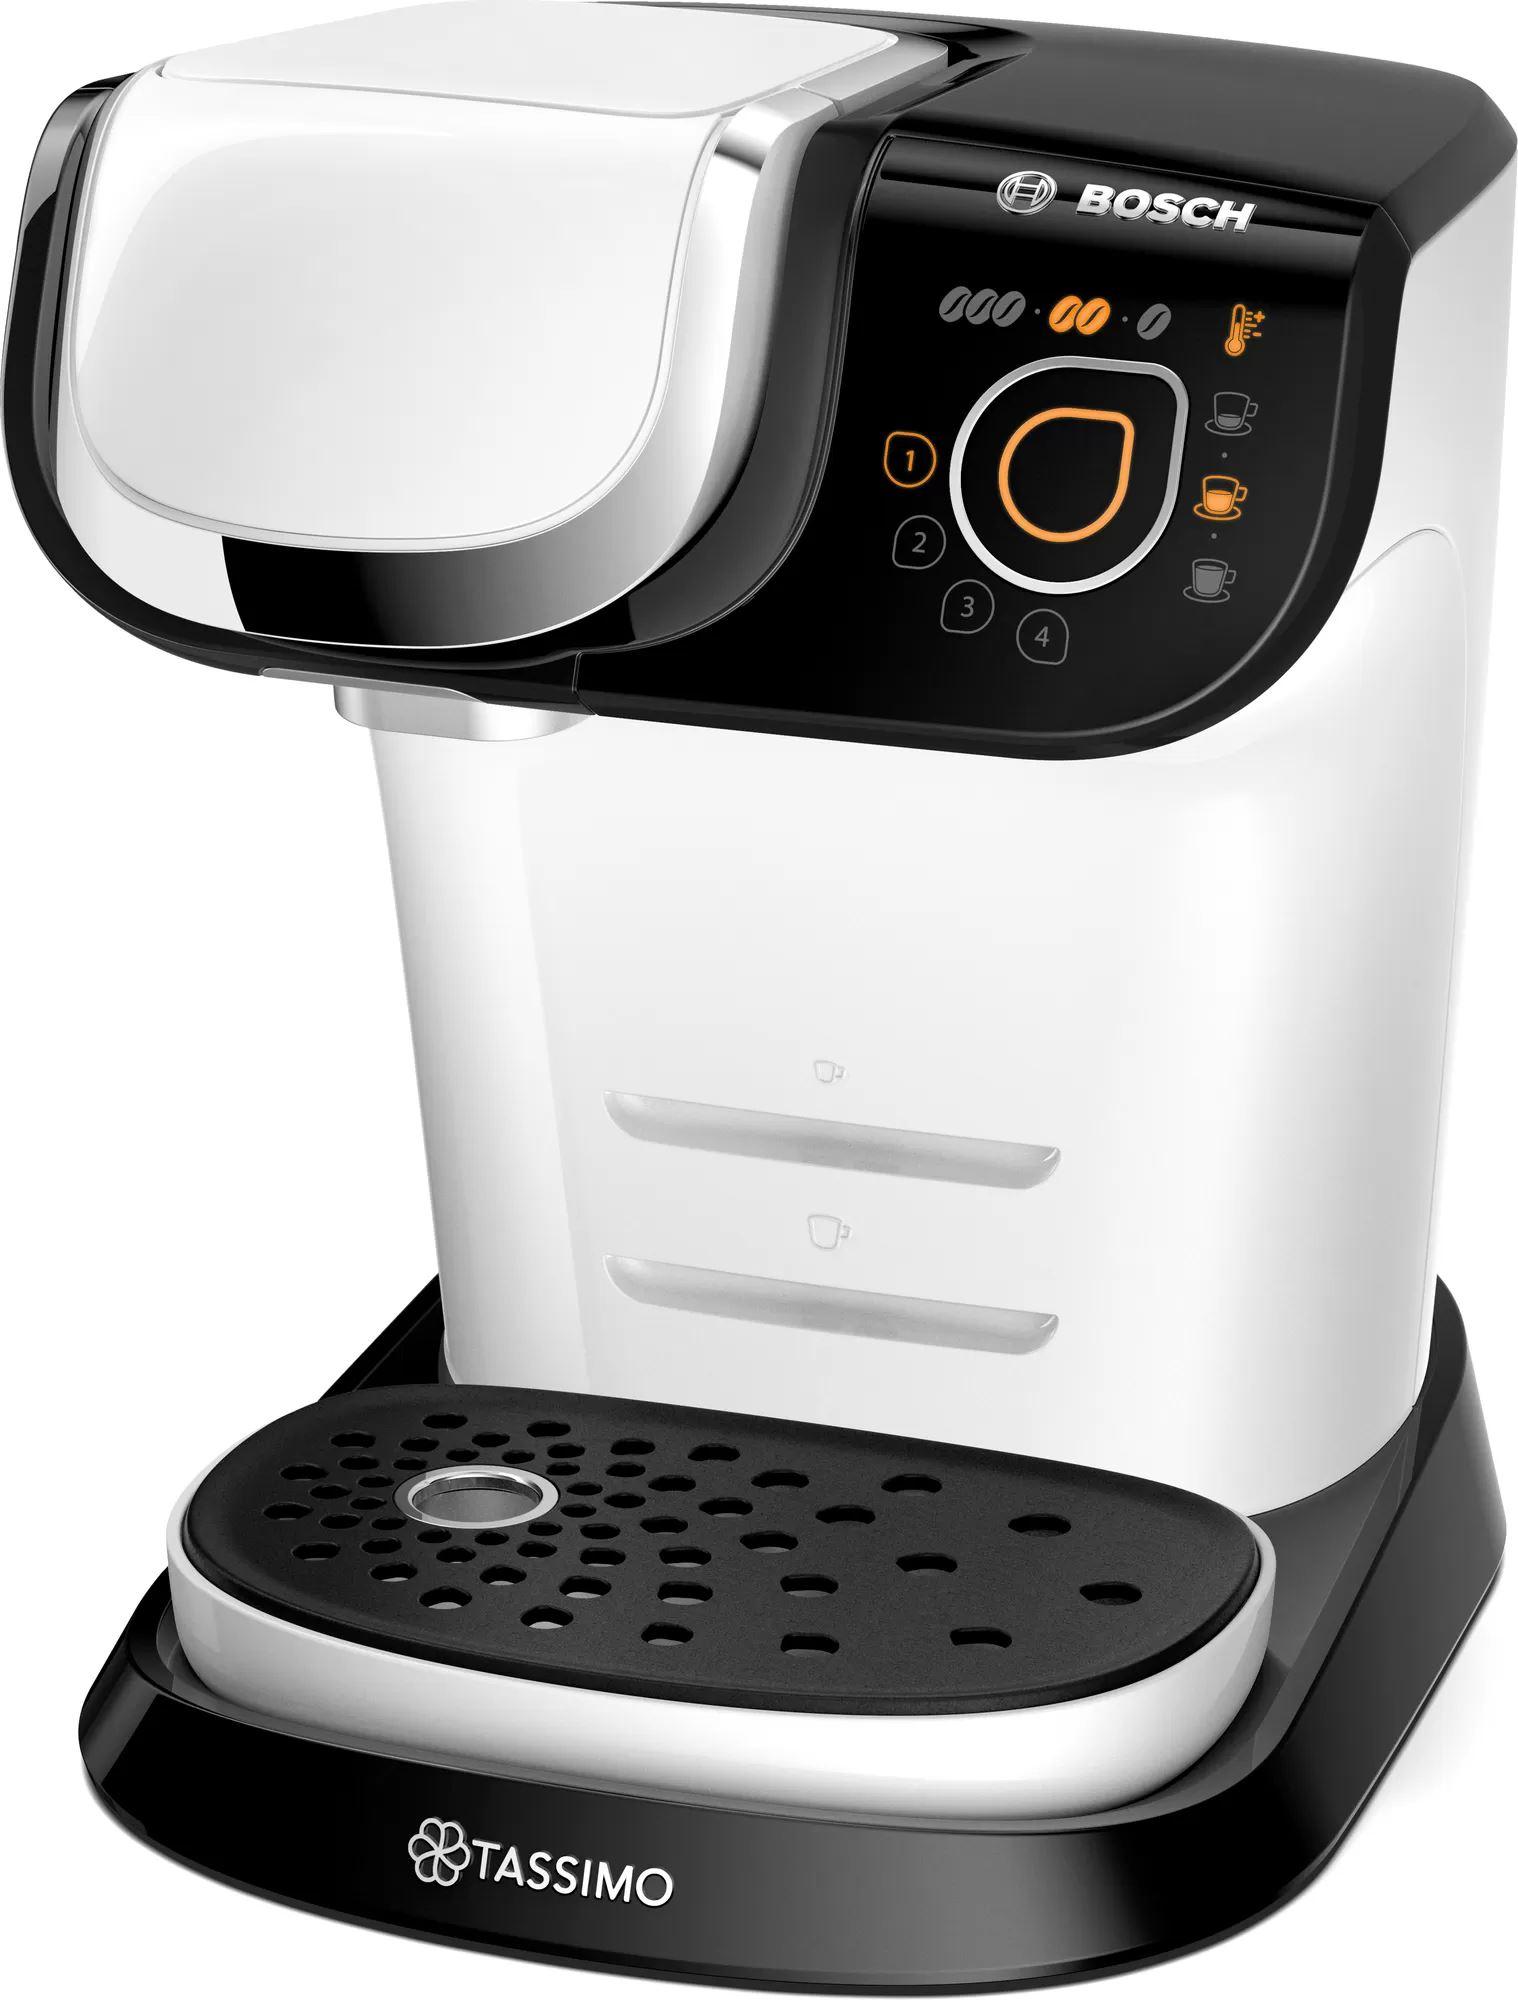 Кофемашина капсульного типа Bosch Tassimo TAS6504 White